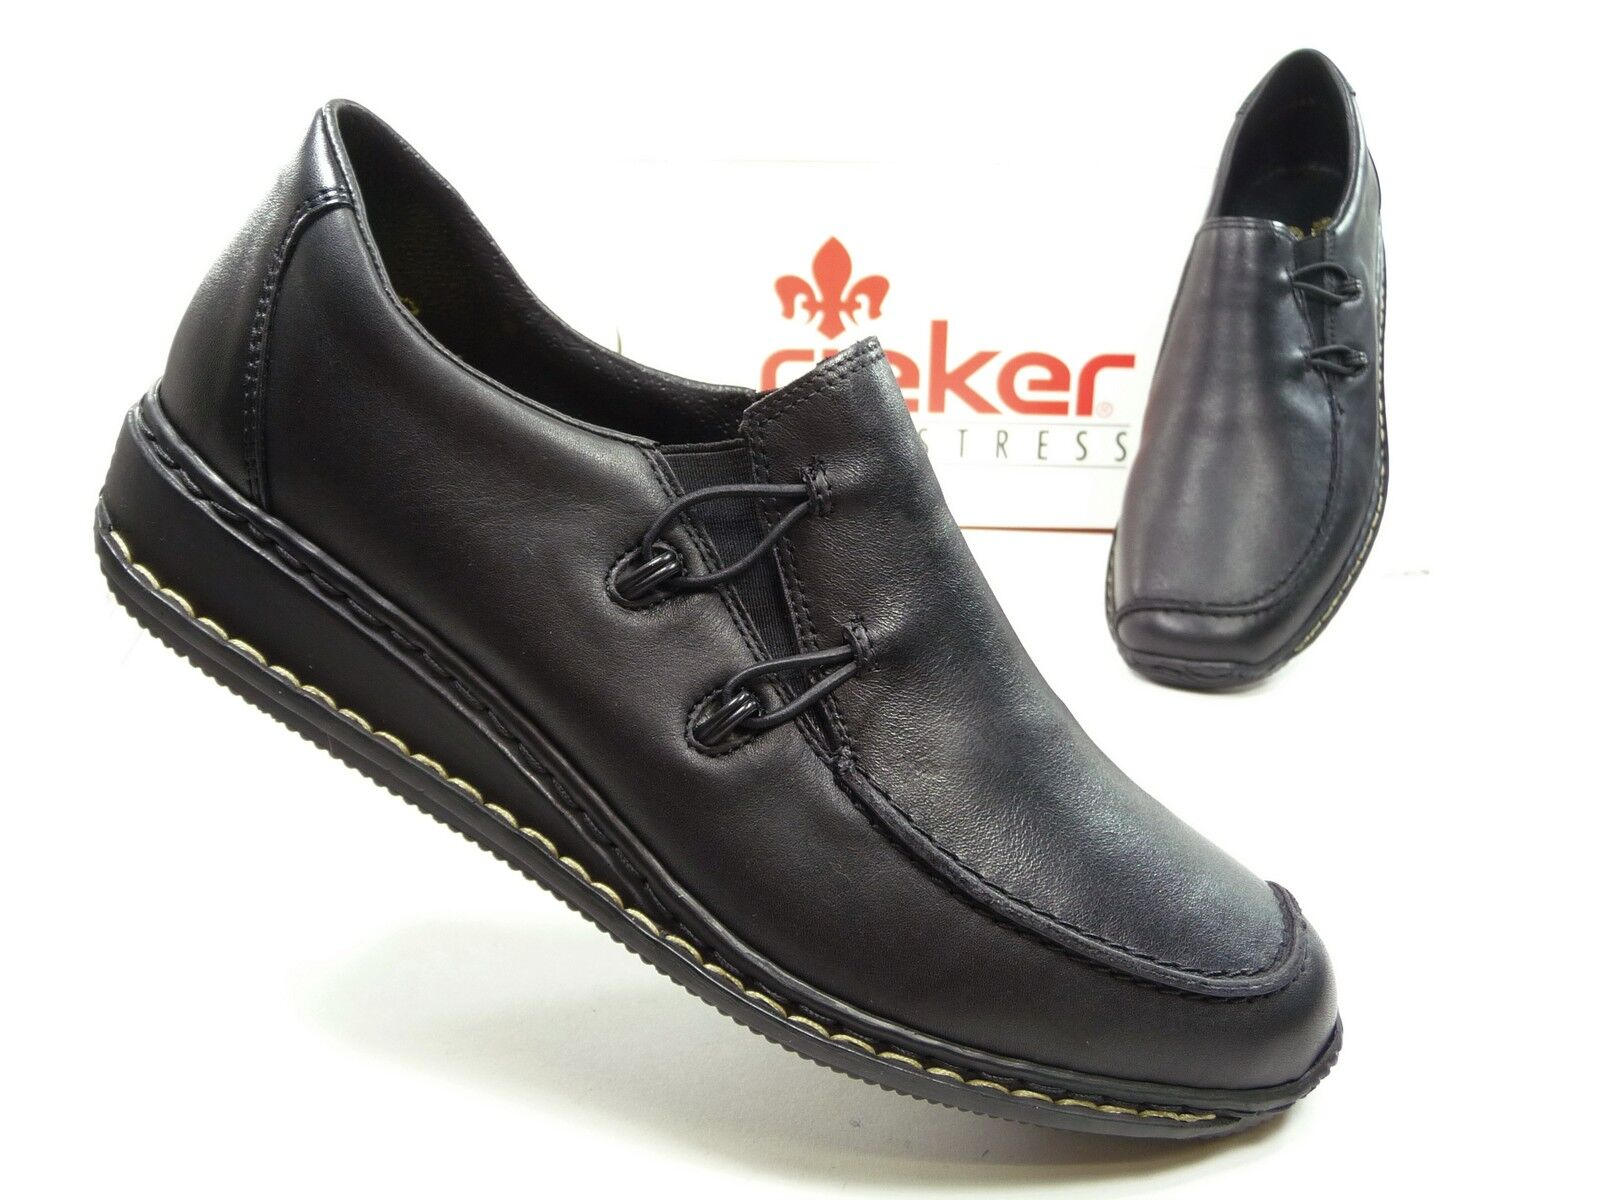 Rieker Damen Schuhe Halbschuhe Slipper in Schwarz,  Art.Nr. 44361-00